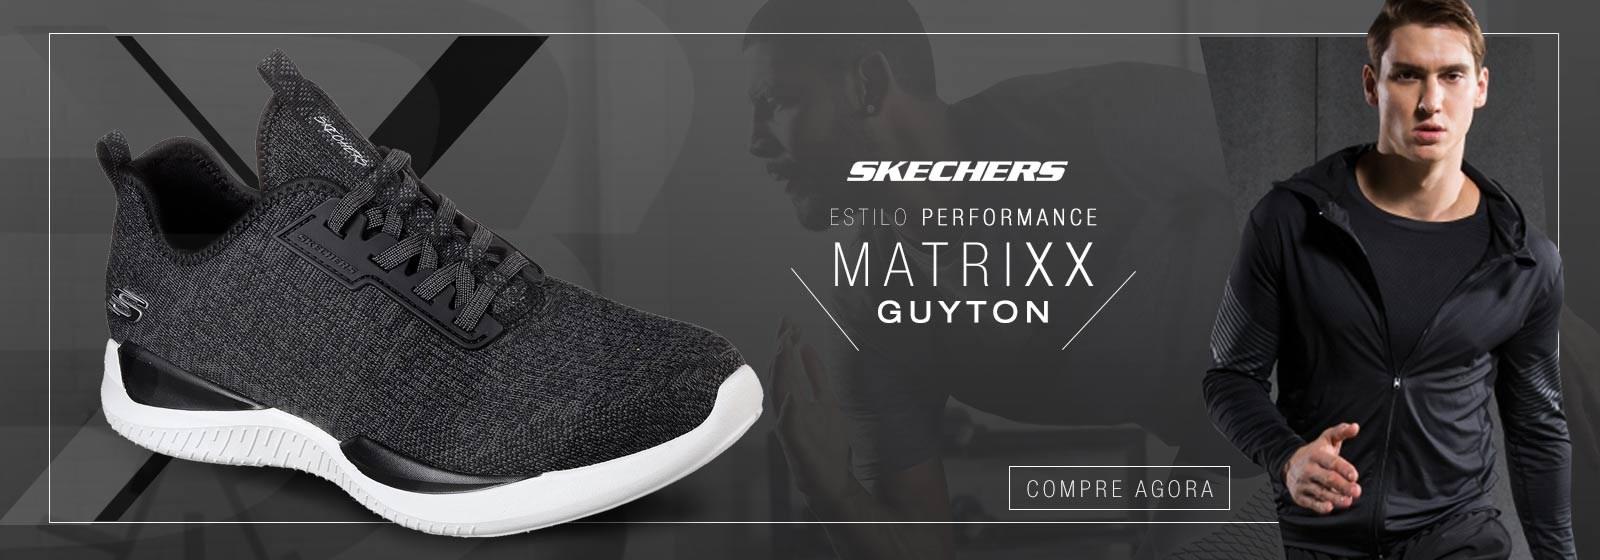 Skechers Matrixx